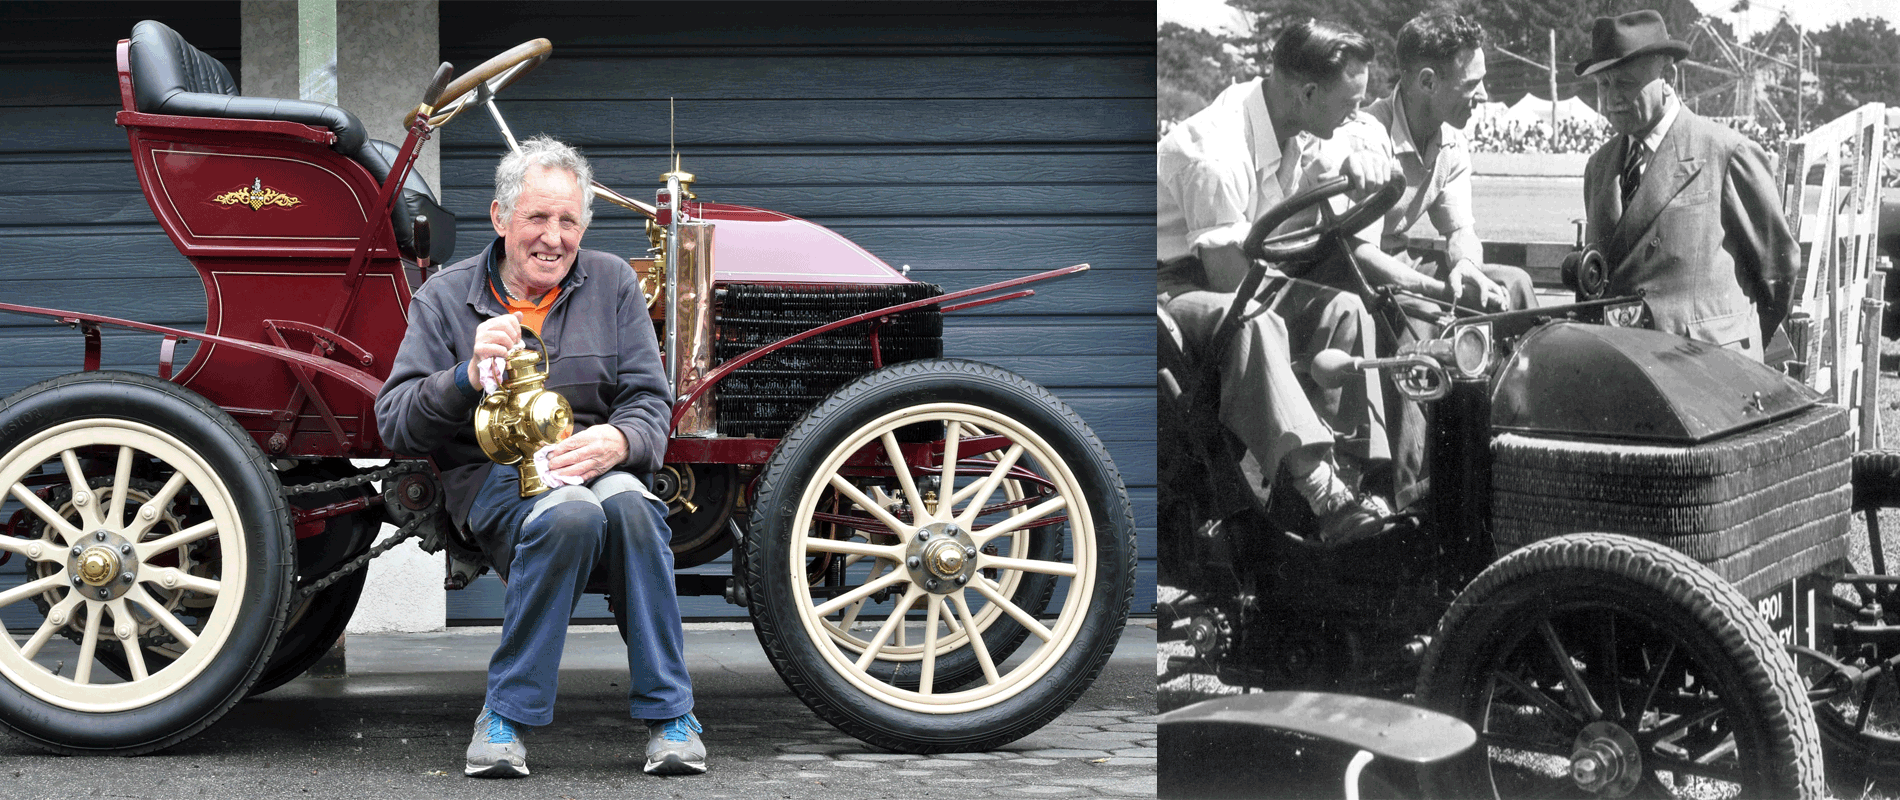 'Grandma' No Getaway Car But Still Good For Rallies - Check out Colin Winter's 1900 Wolseley